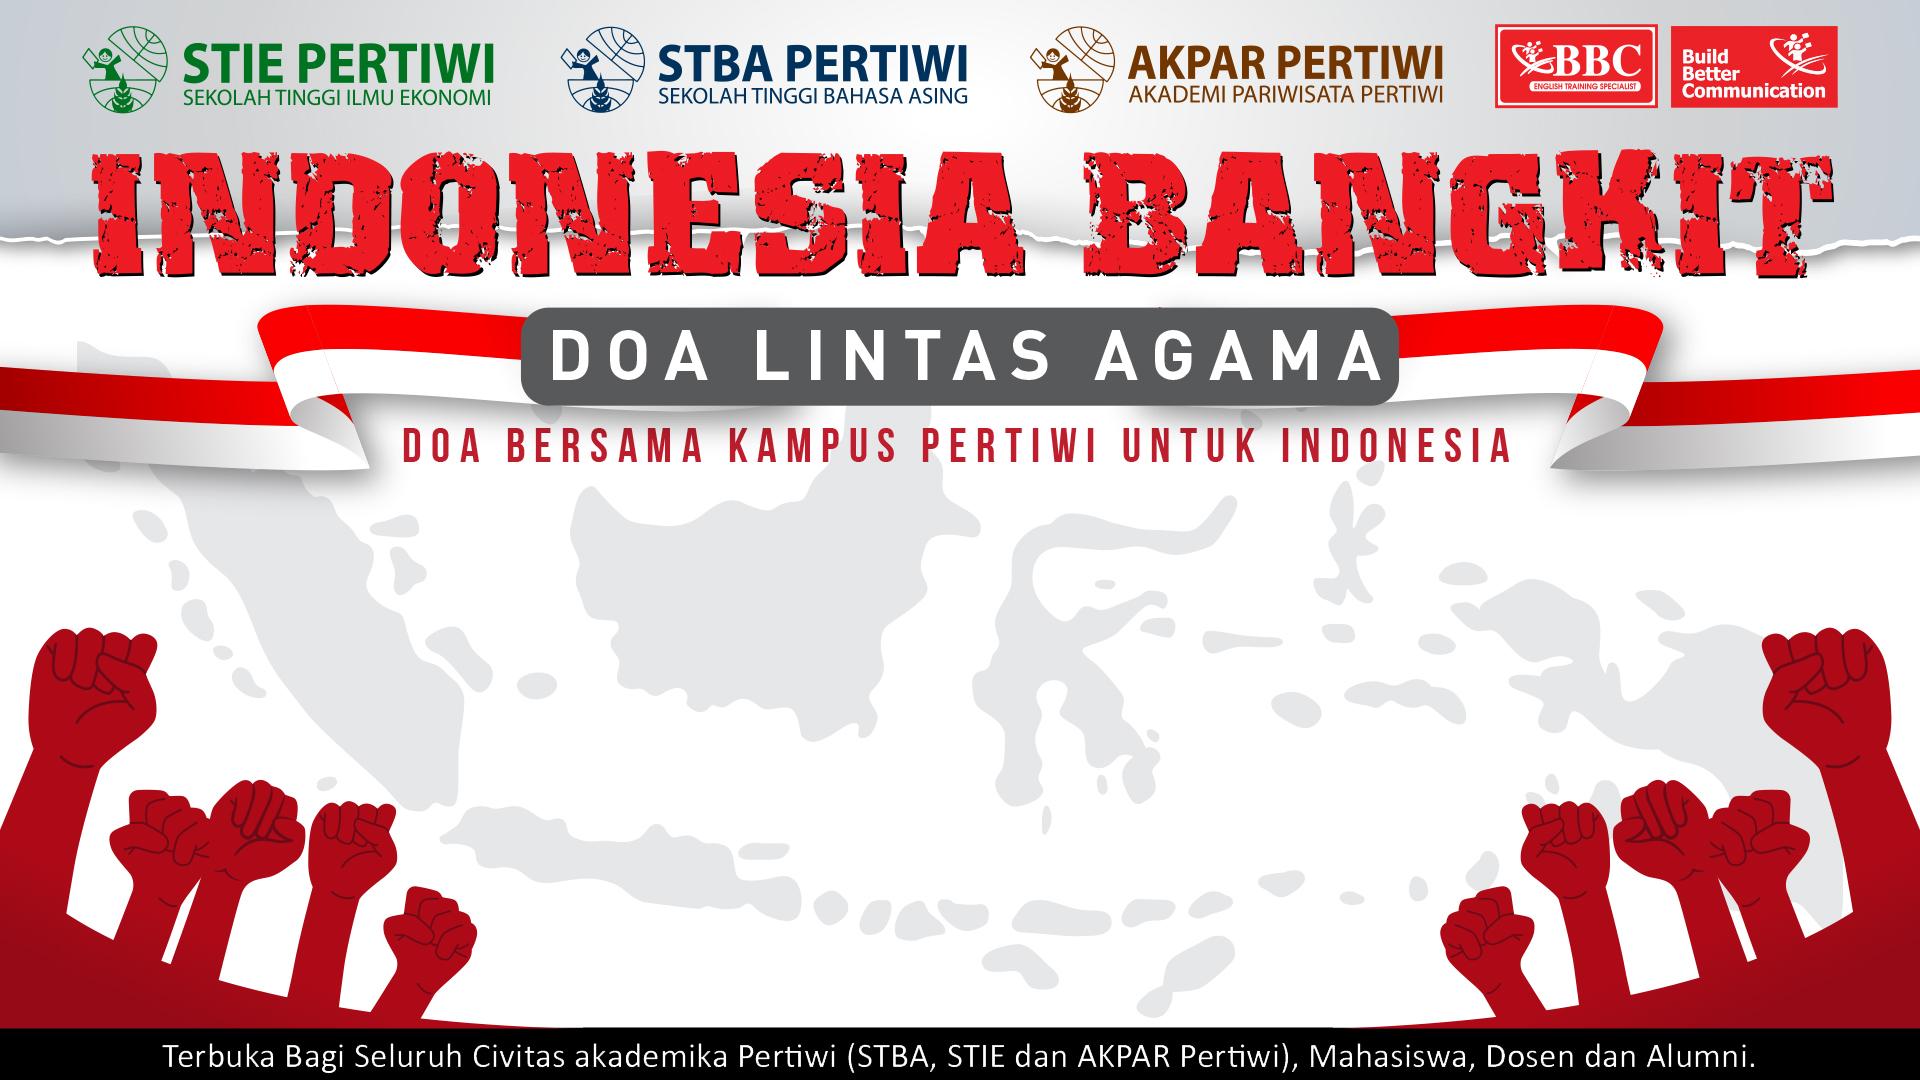 Gerakan Indonesia Bangkit : Doa Lintas Agama Untuk Bumi Pertiwi